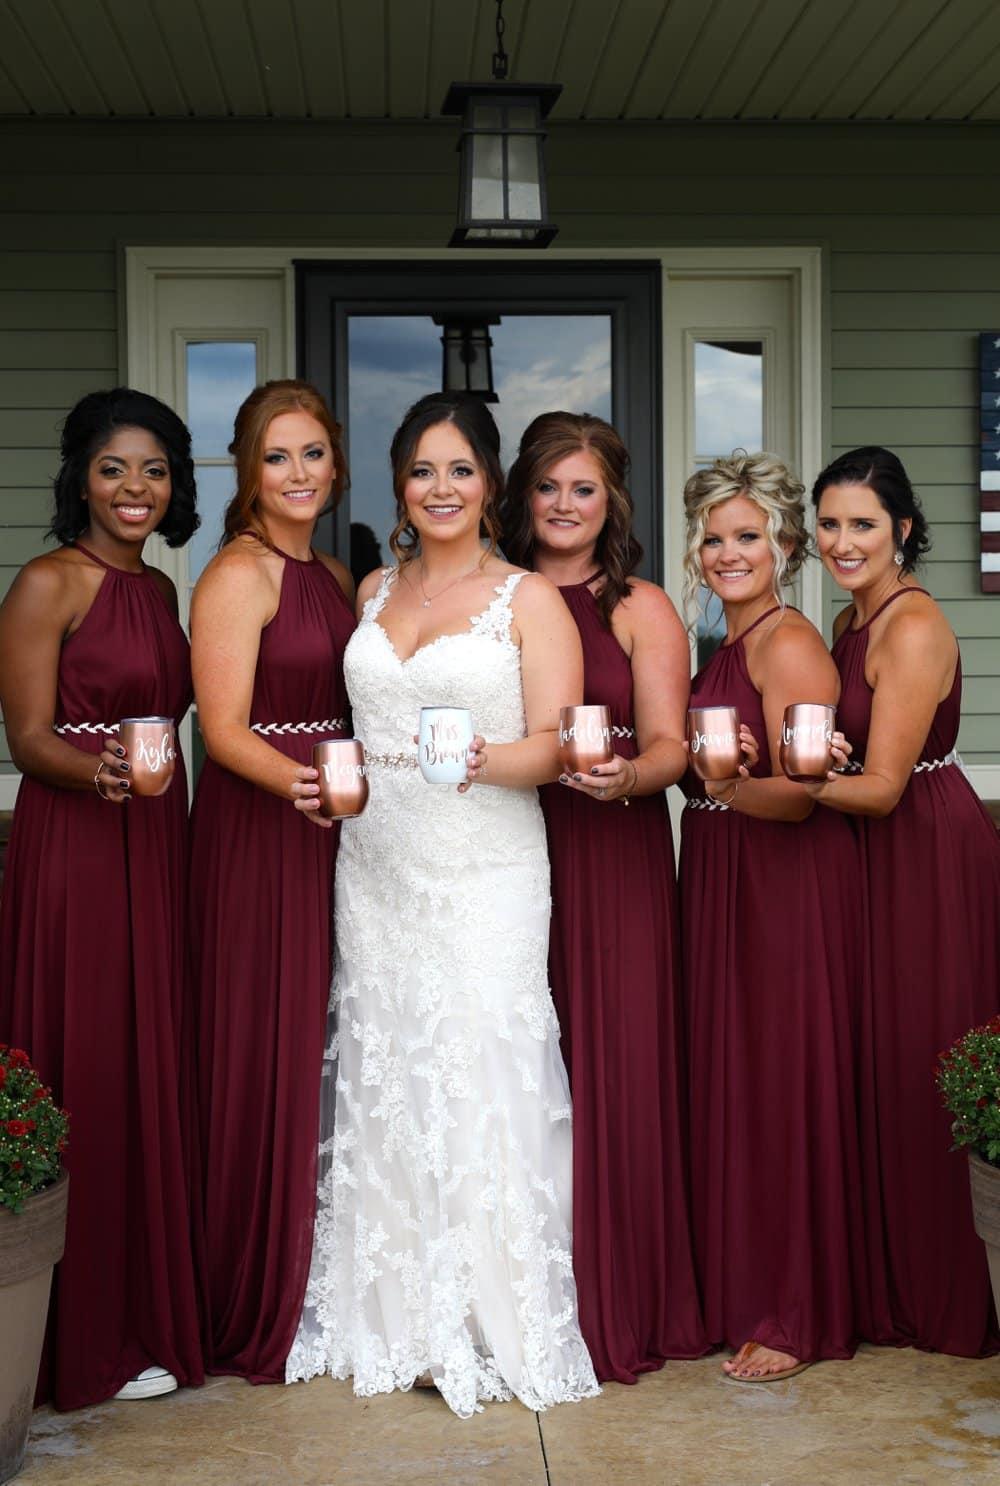 Rustic Glam Backyard Wedding